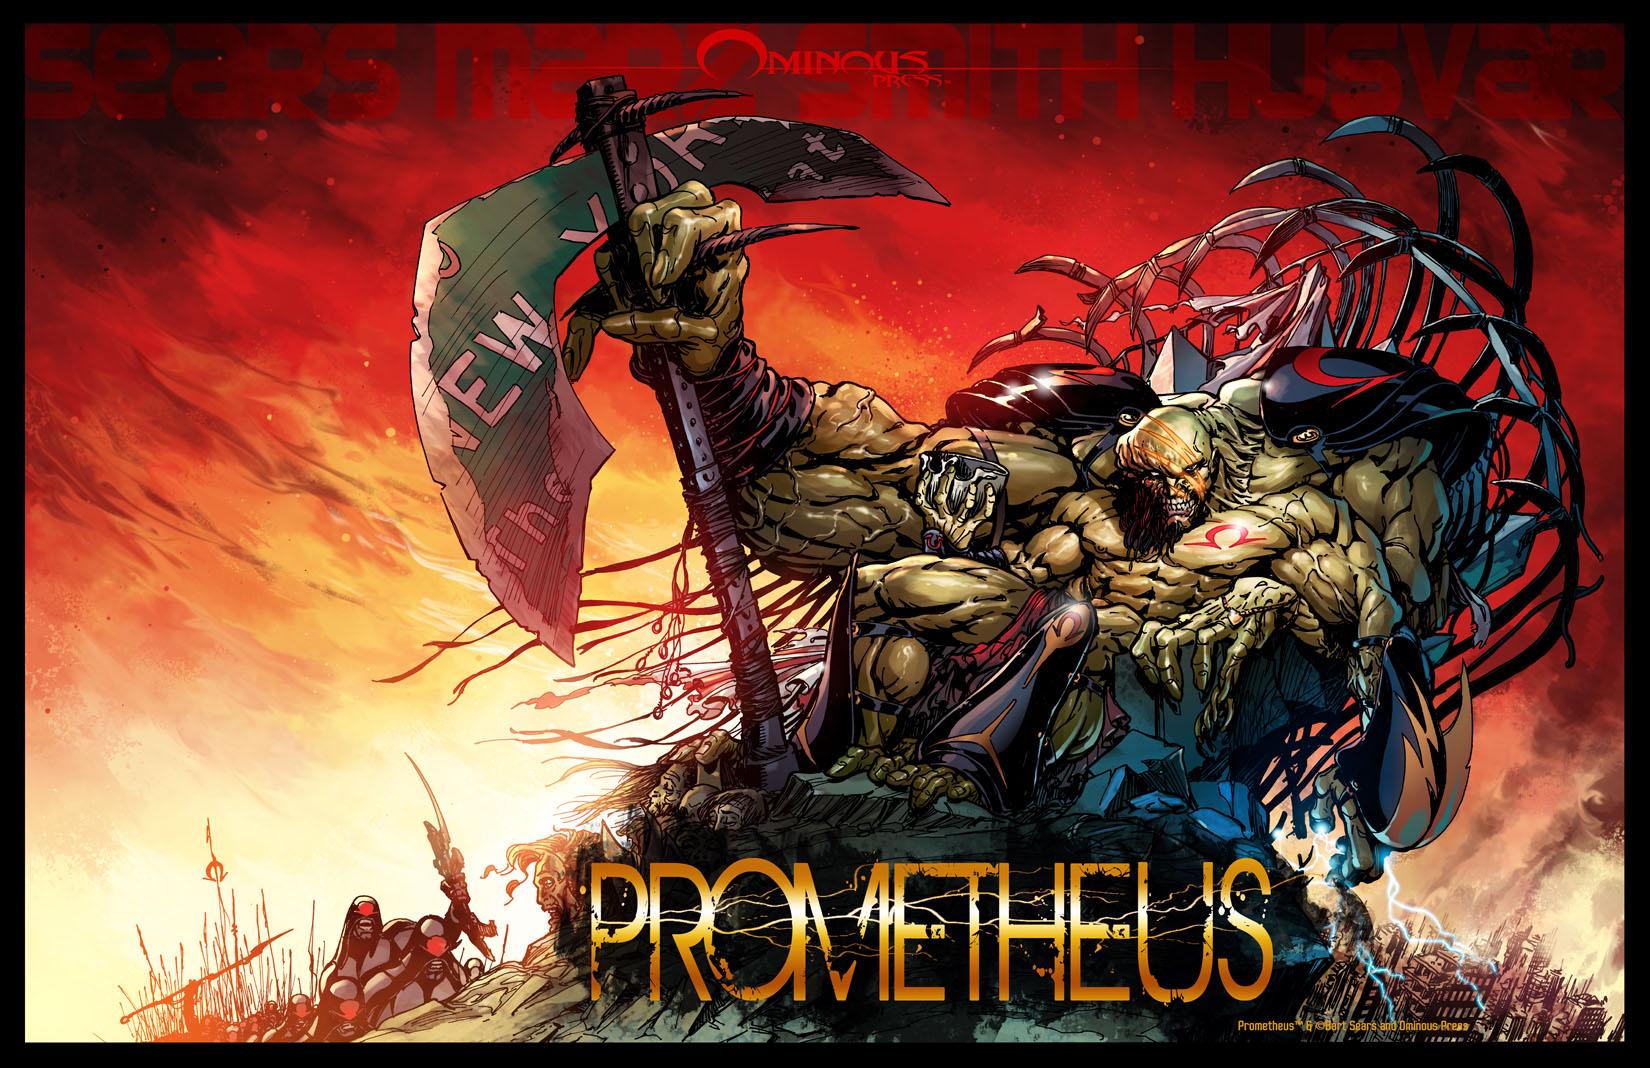 LordZeus_Promo1_FINAL_PRINT_150dpi